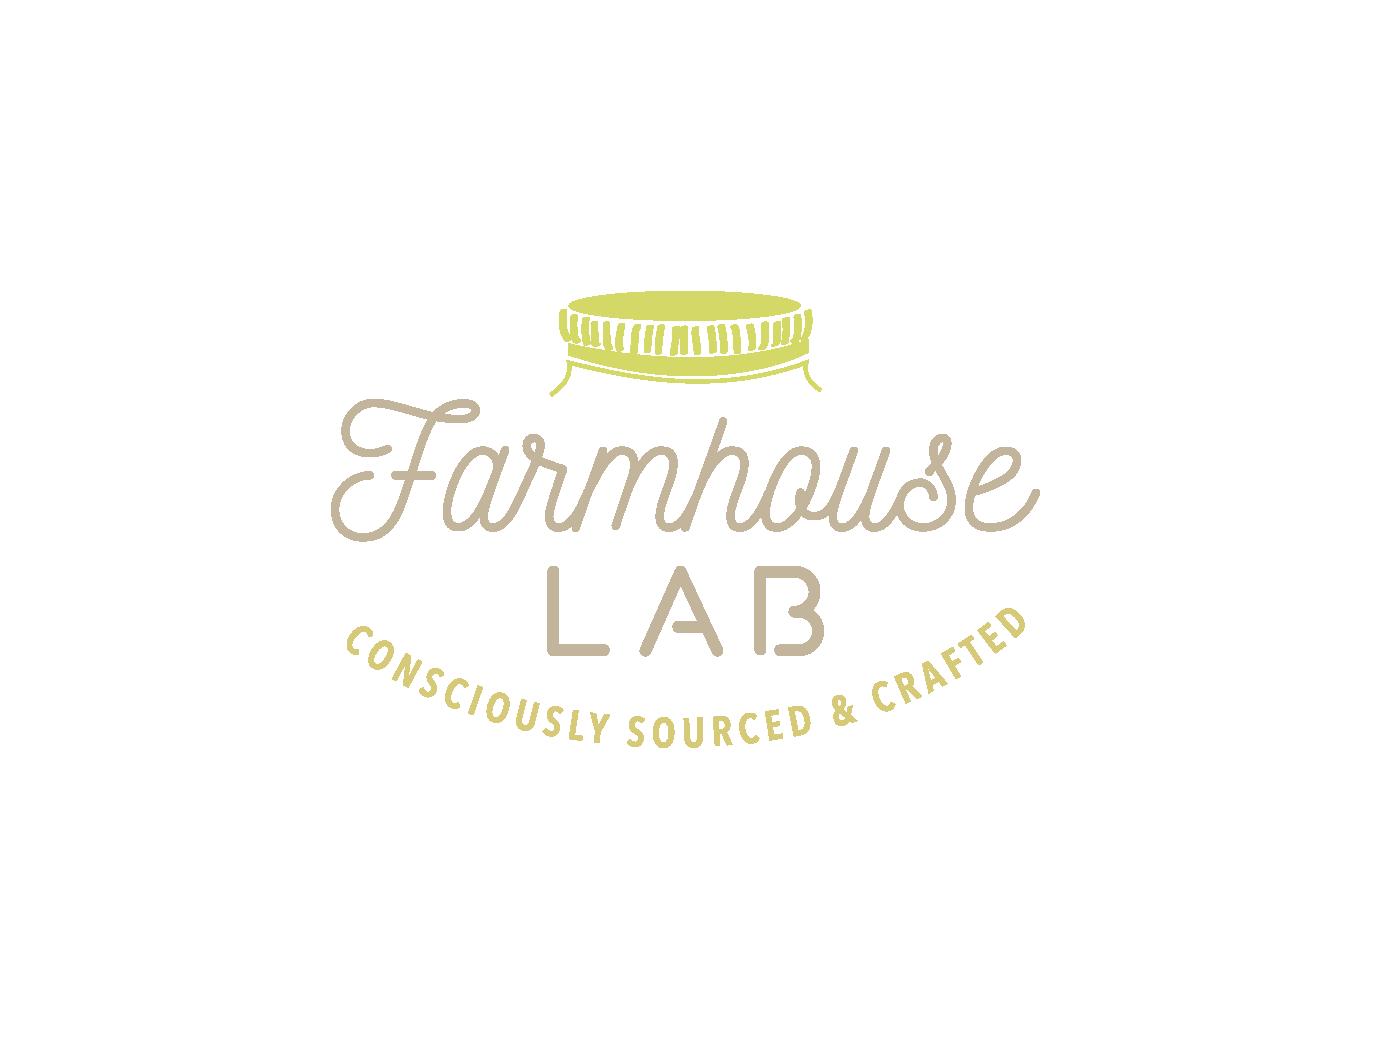 Farmhouse Lab